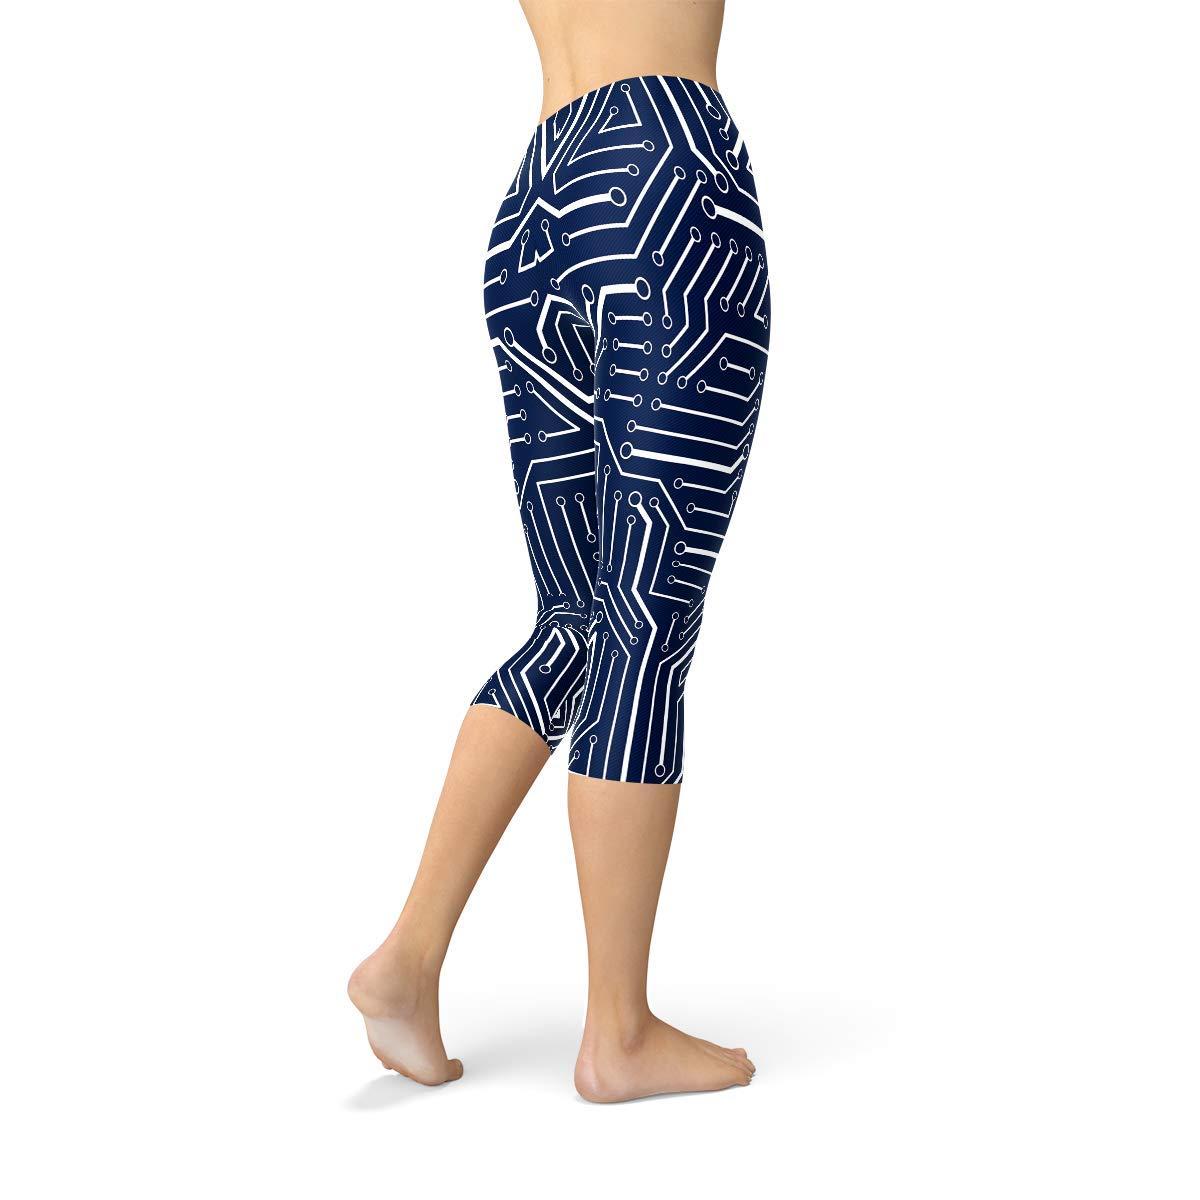 Satori Stylez Robot Capri Leggings Navy Blue Cosplay Cyborg Circuitry Yoga Pants for Women